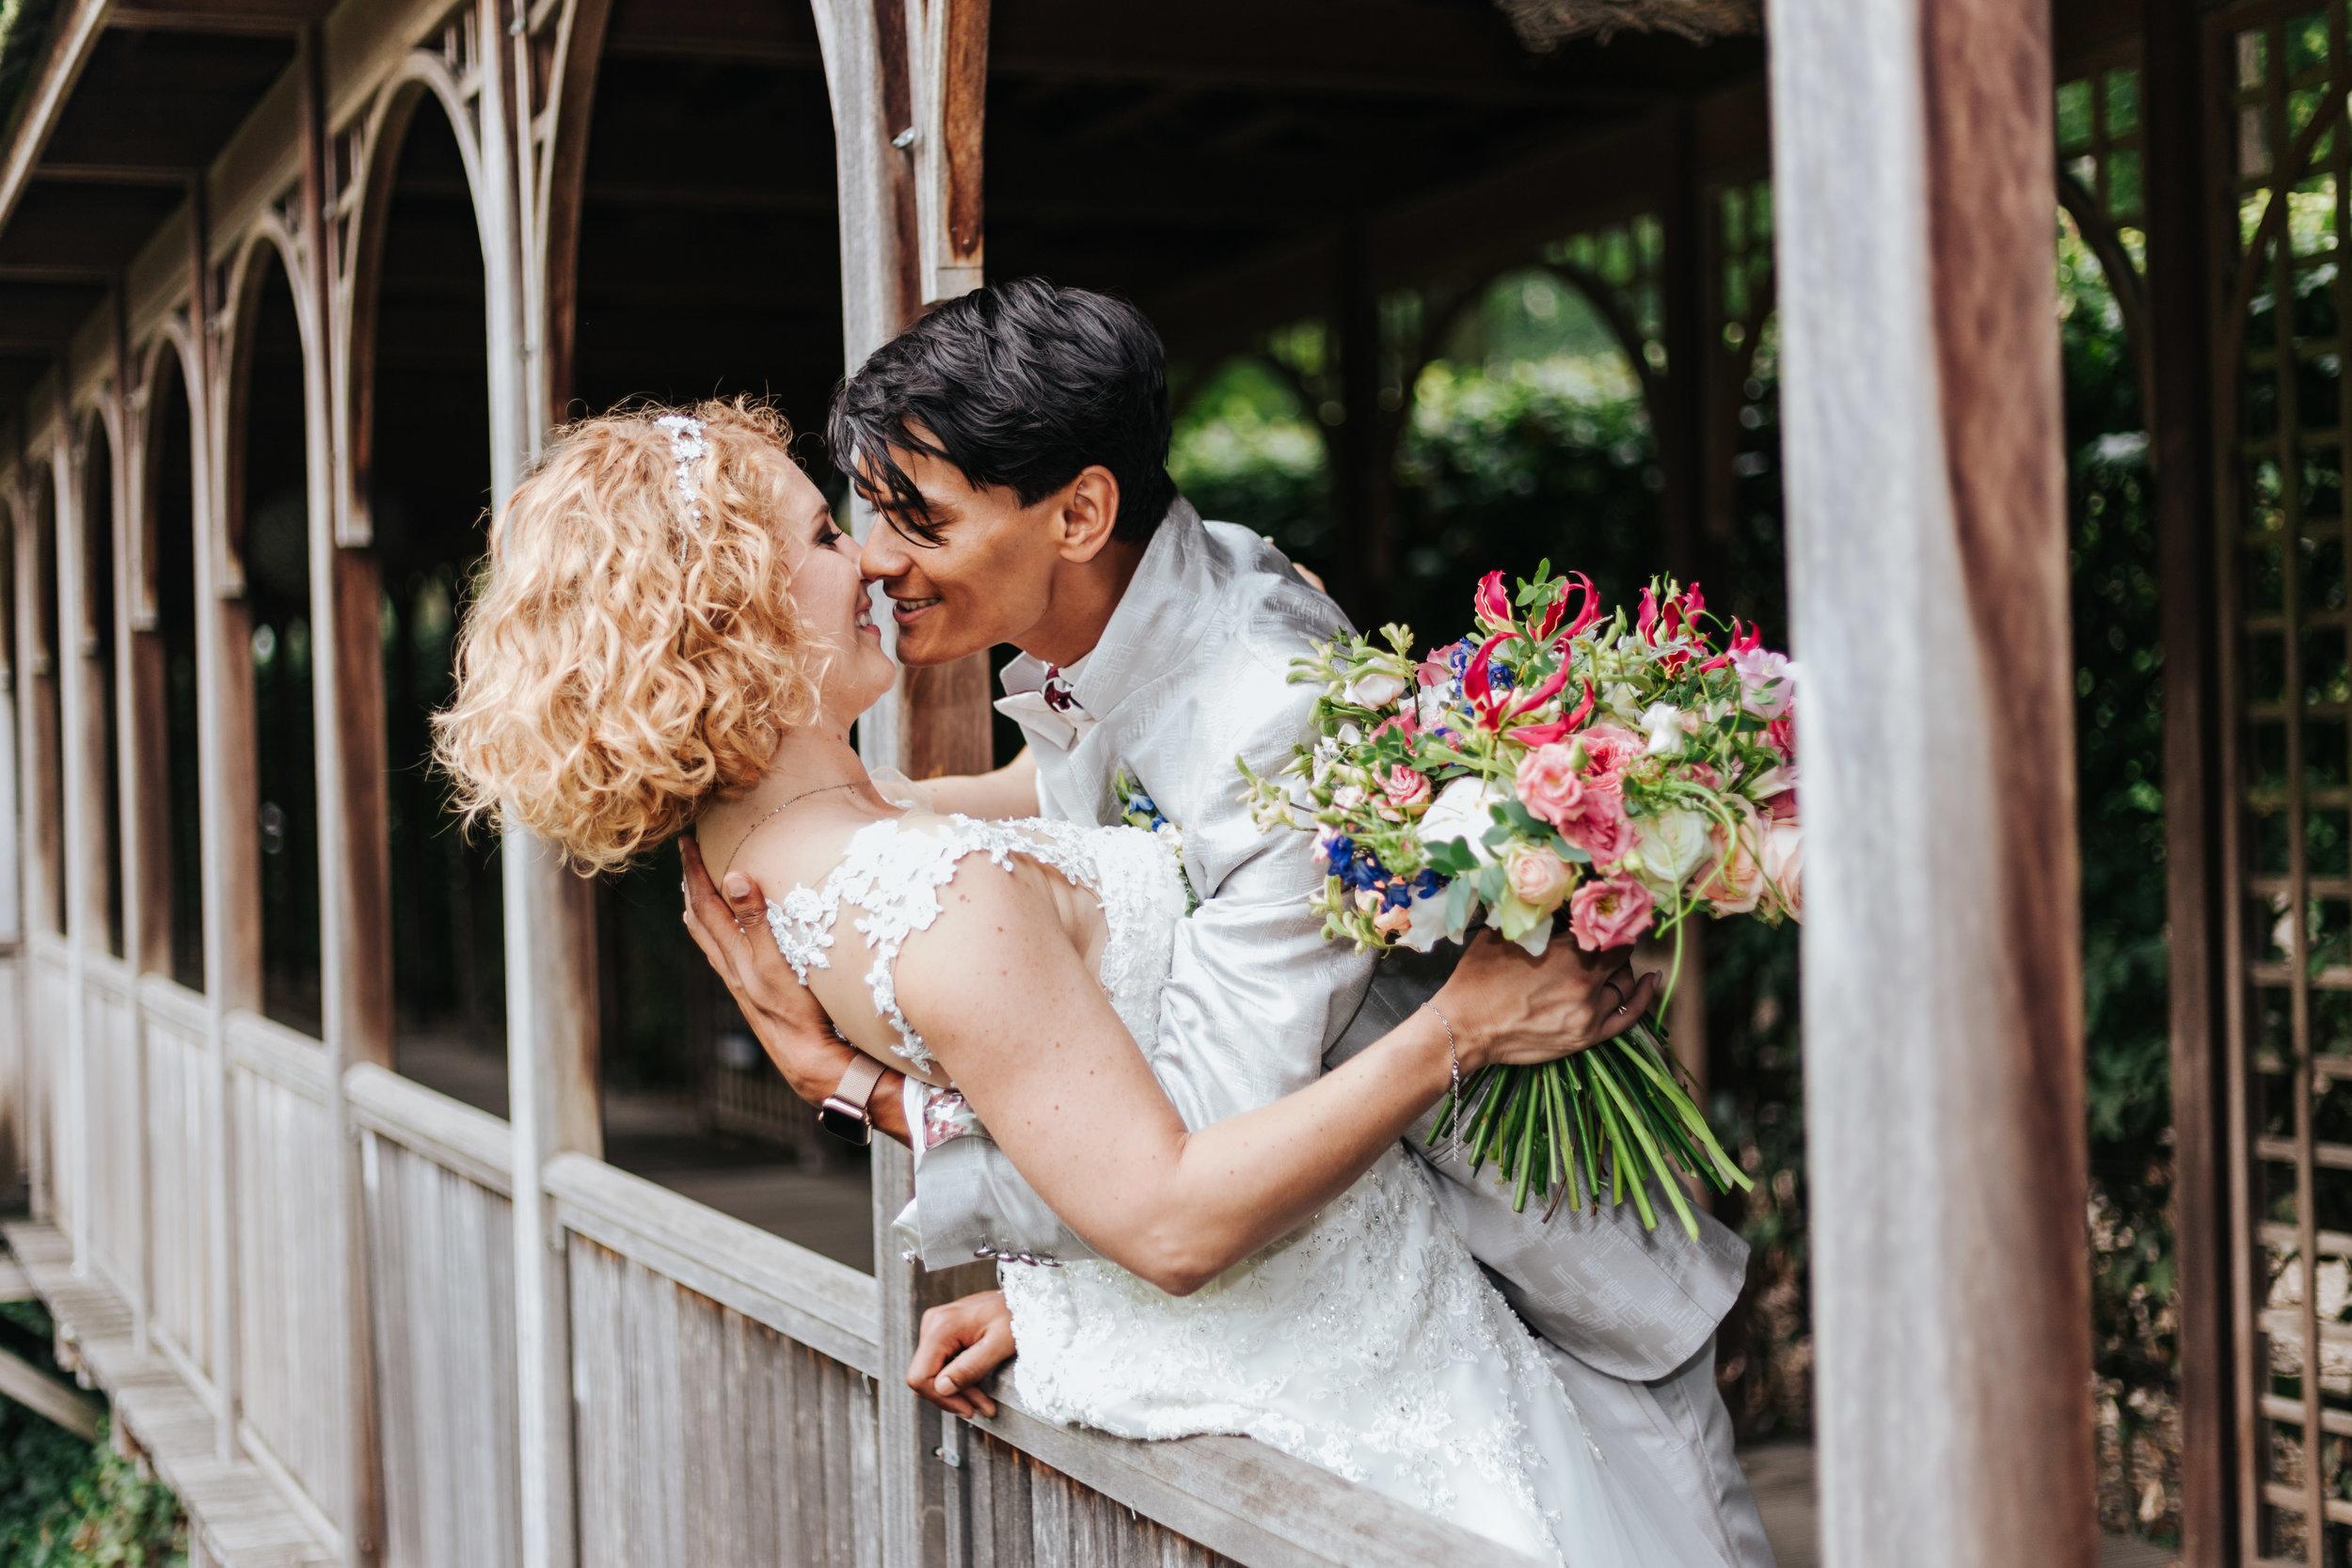 Suzy & Babulu - Huwelijk - 27 juli 2019